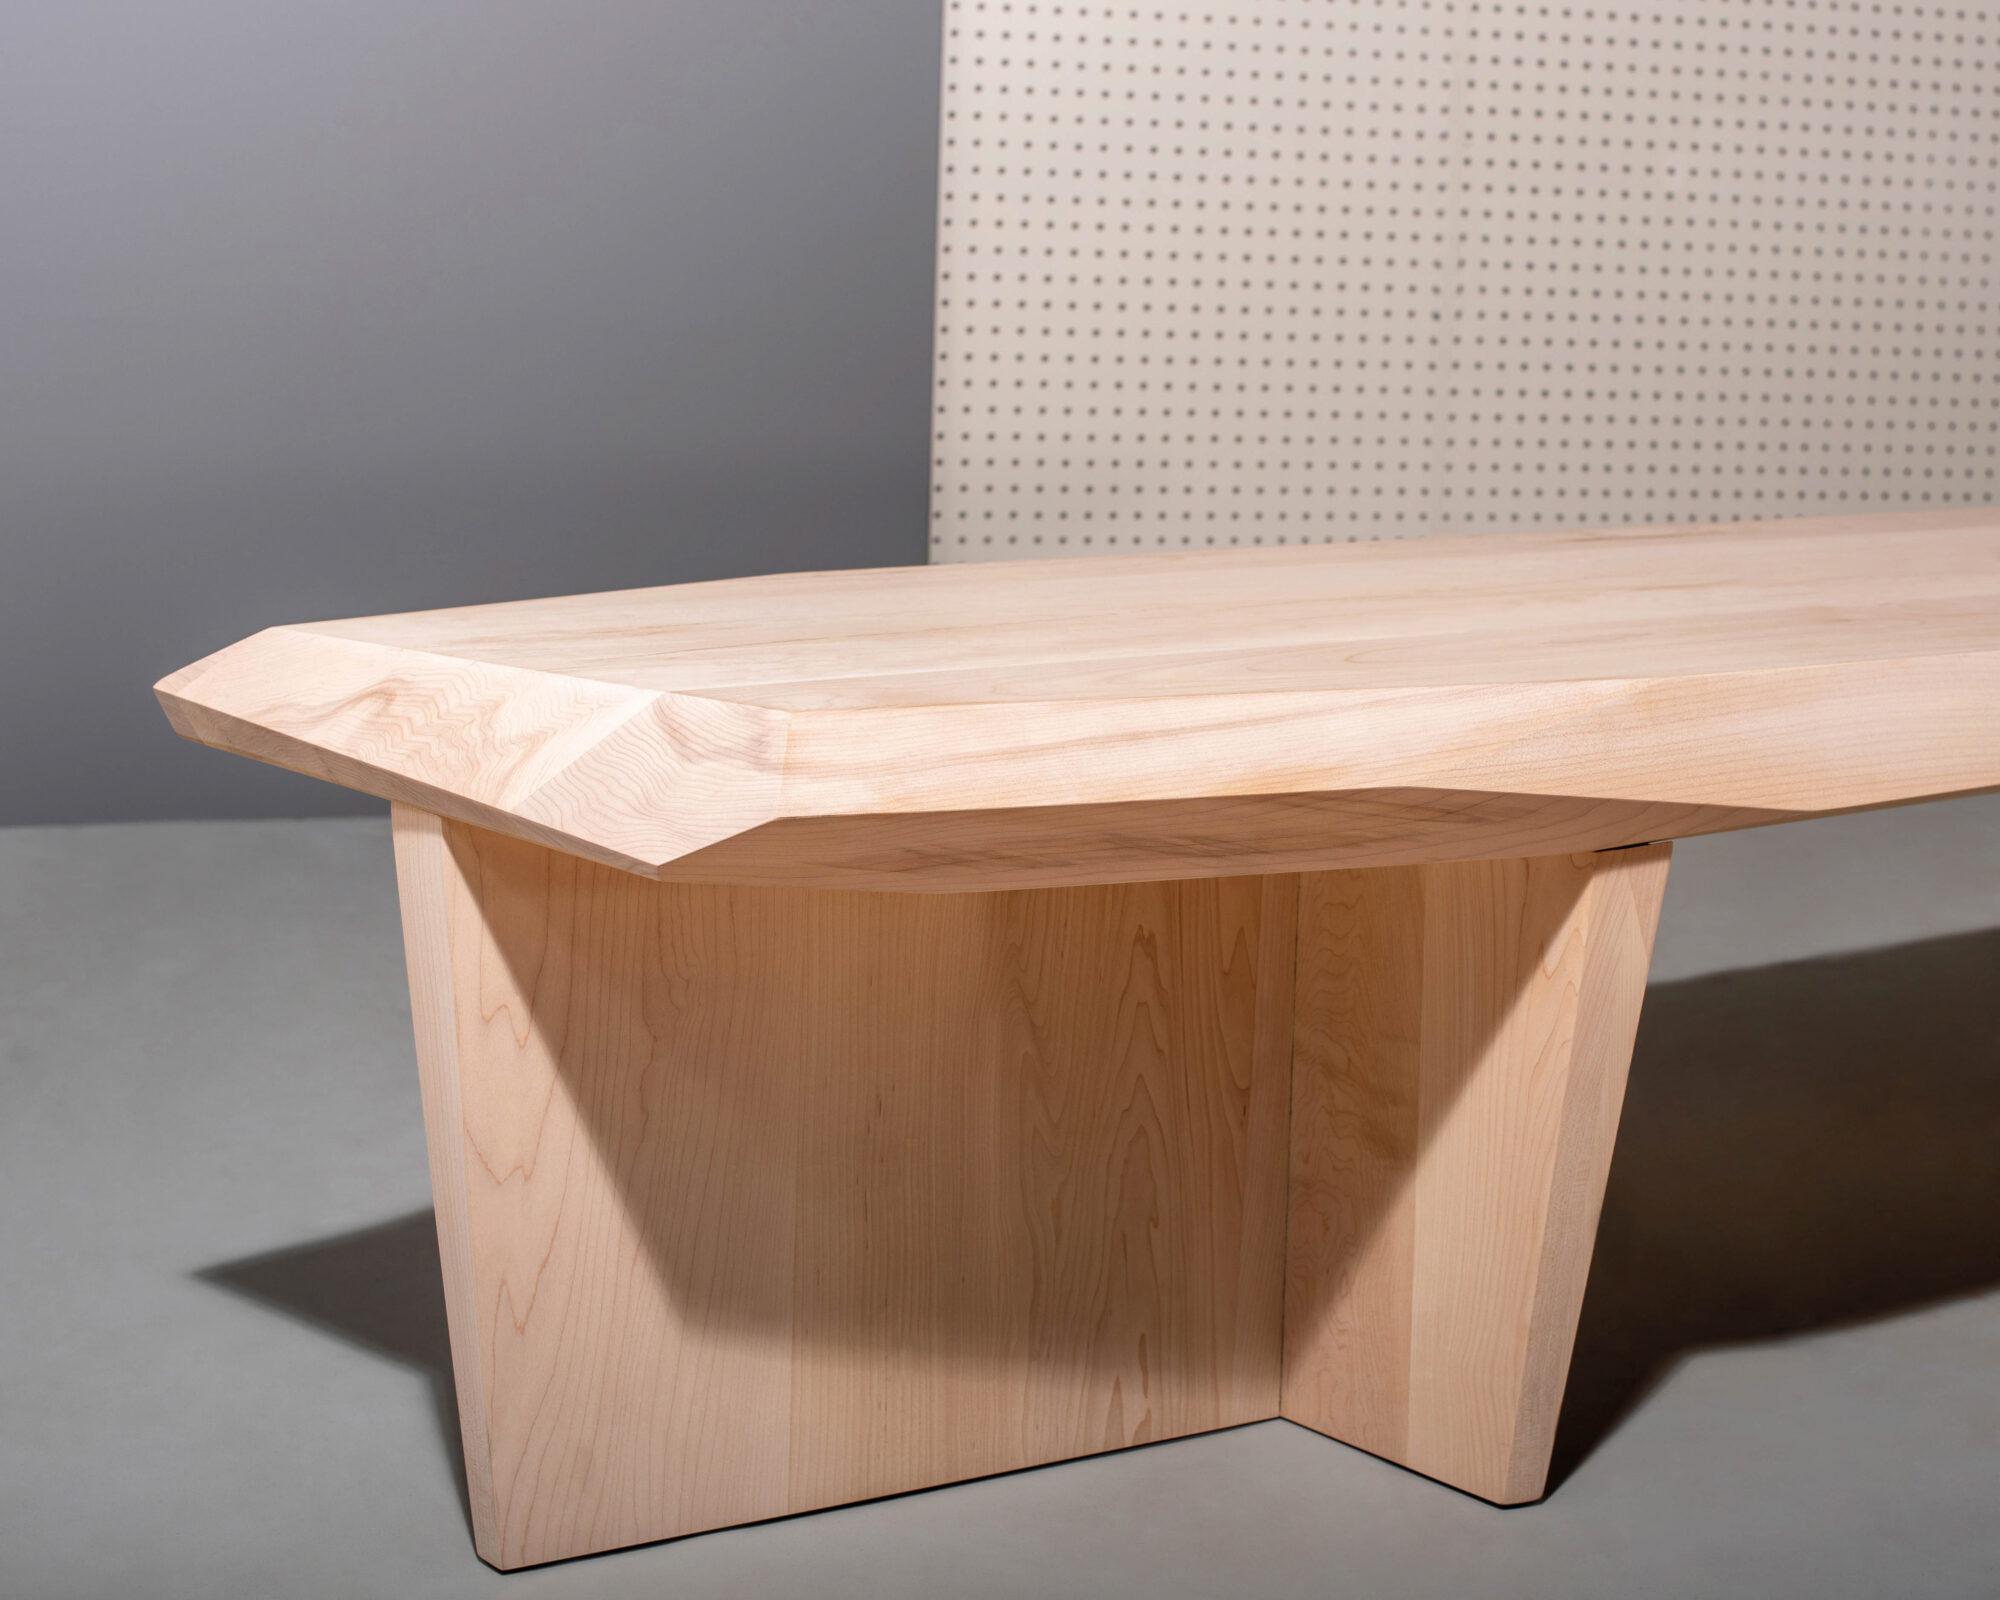 dock 6 wood table